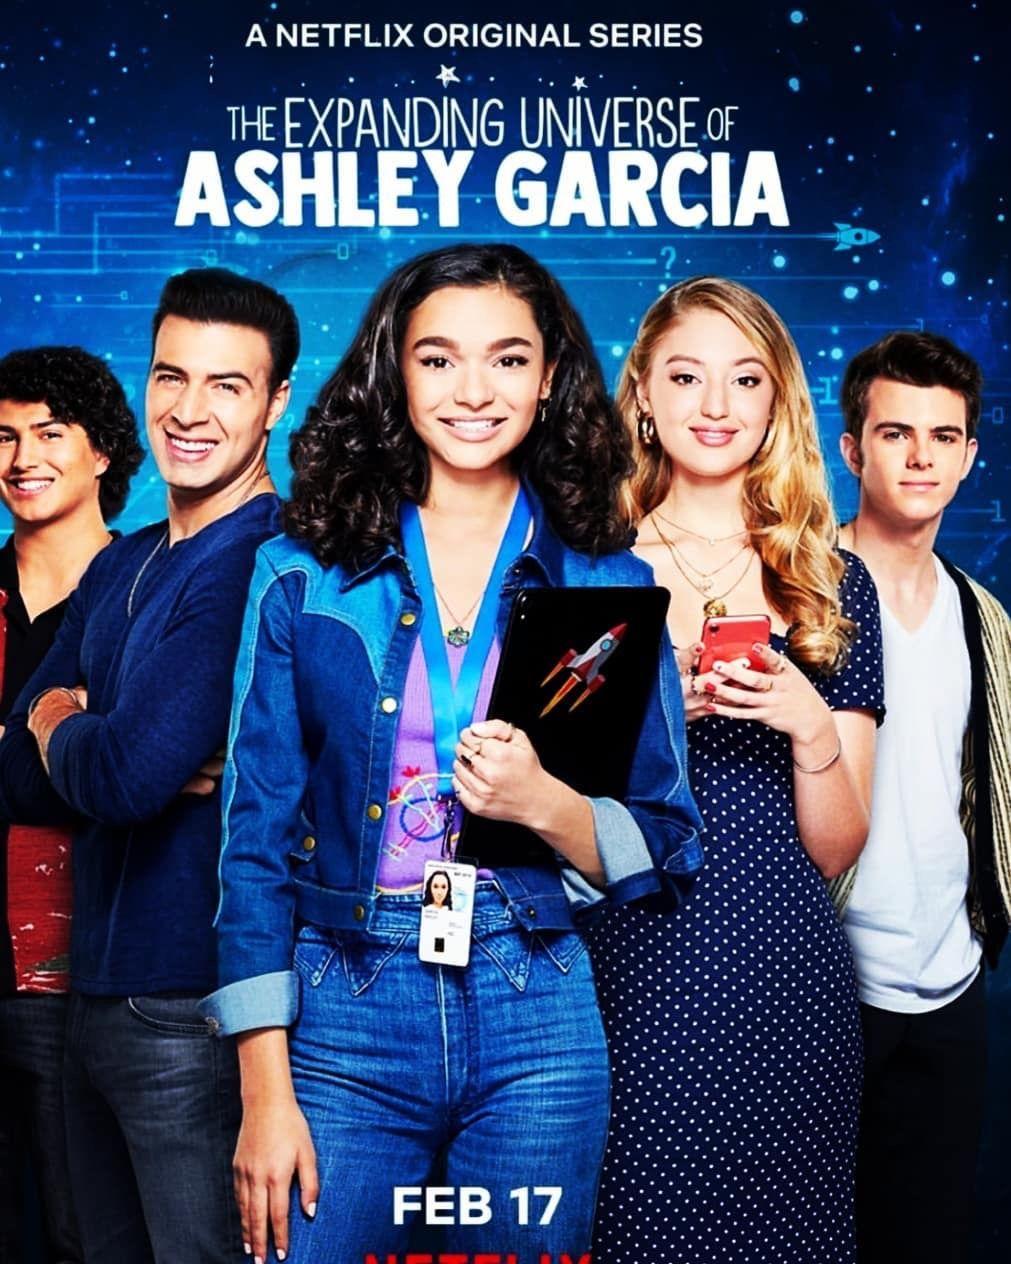 Mario Lopez Produces Youthful Latina Led Show The Expanding Universe Of Ashley Garcia Netflix Filmes E Series Filmes Netflix Capas De Filmes